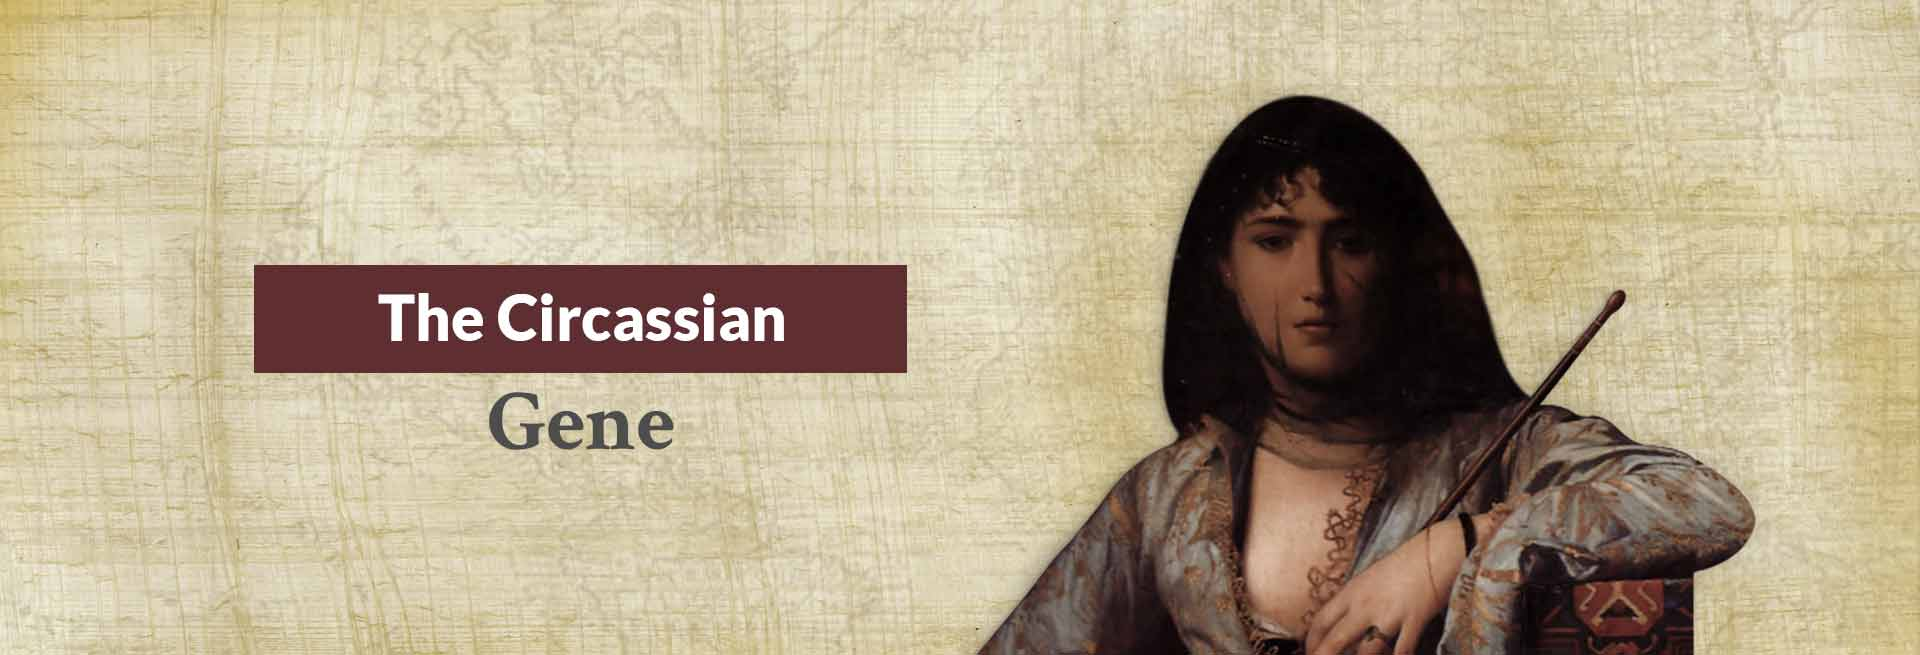 The Circassian Gene Banner